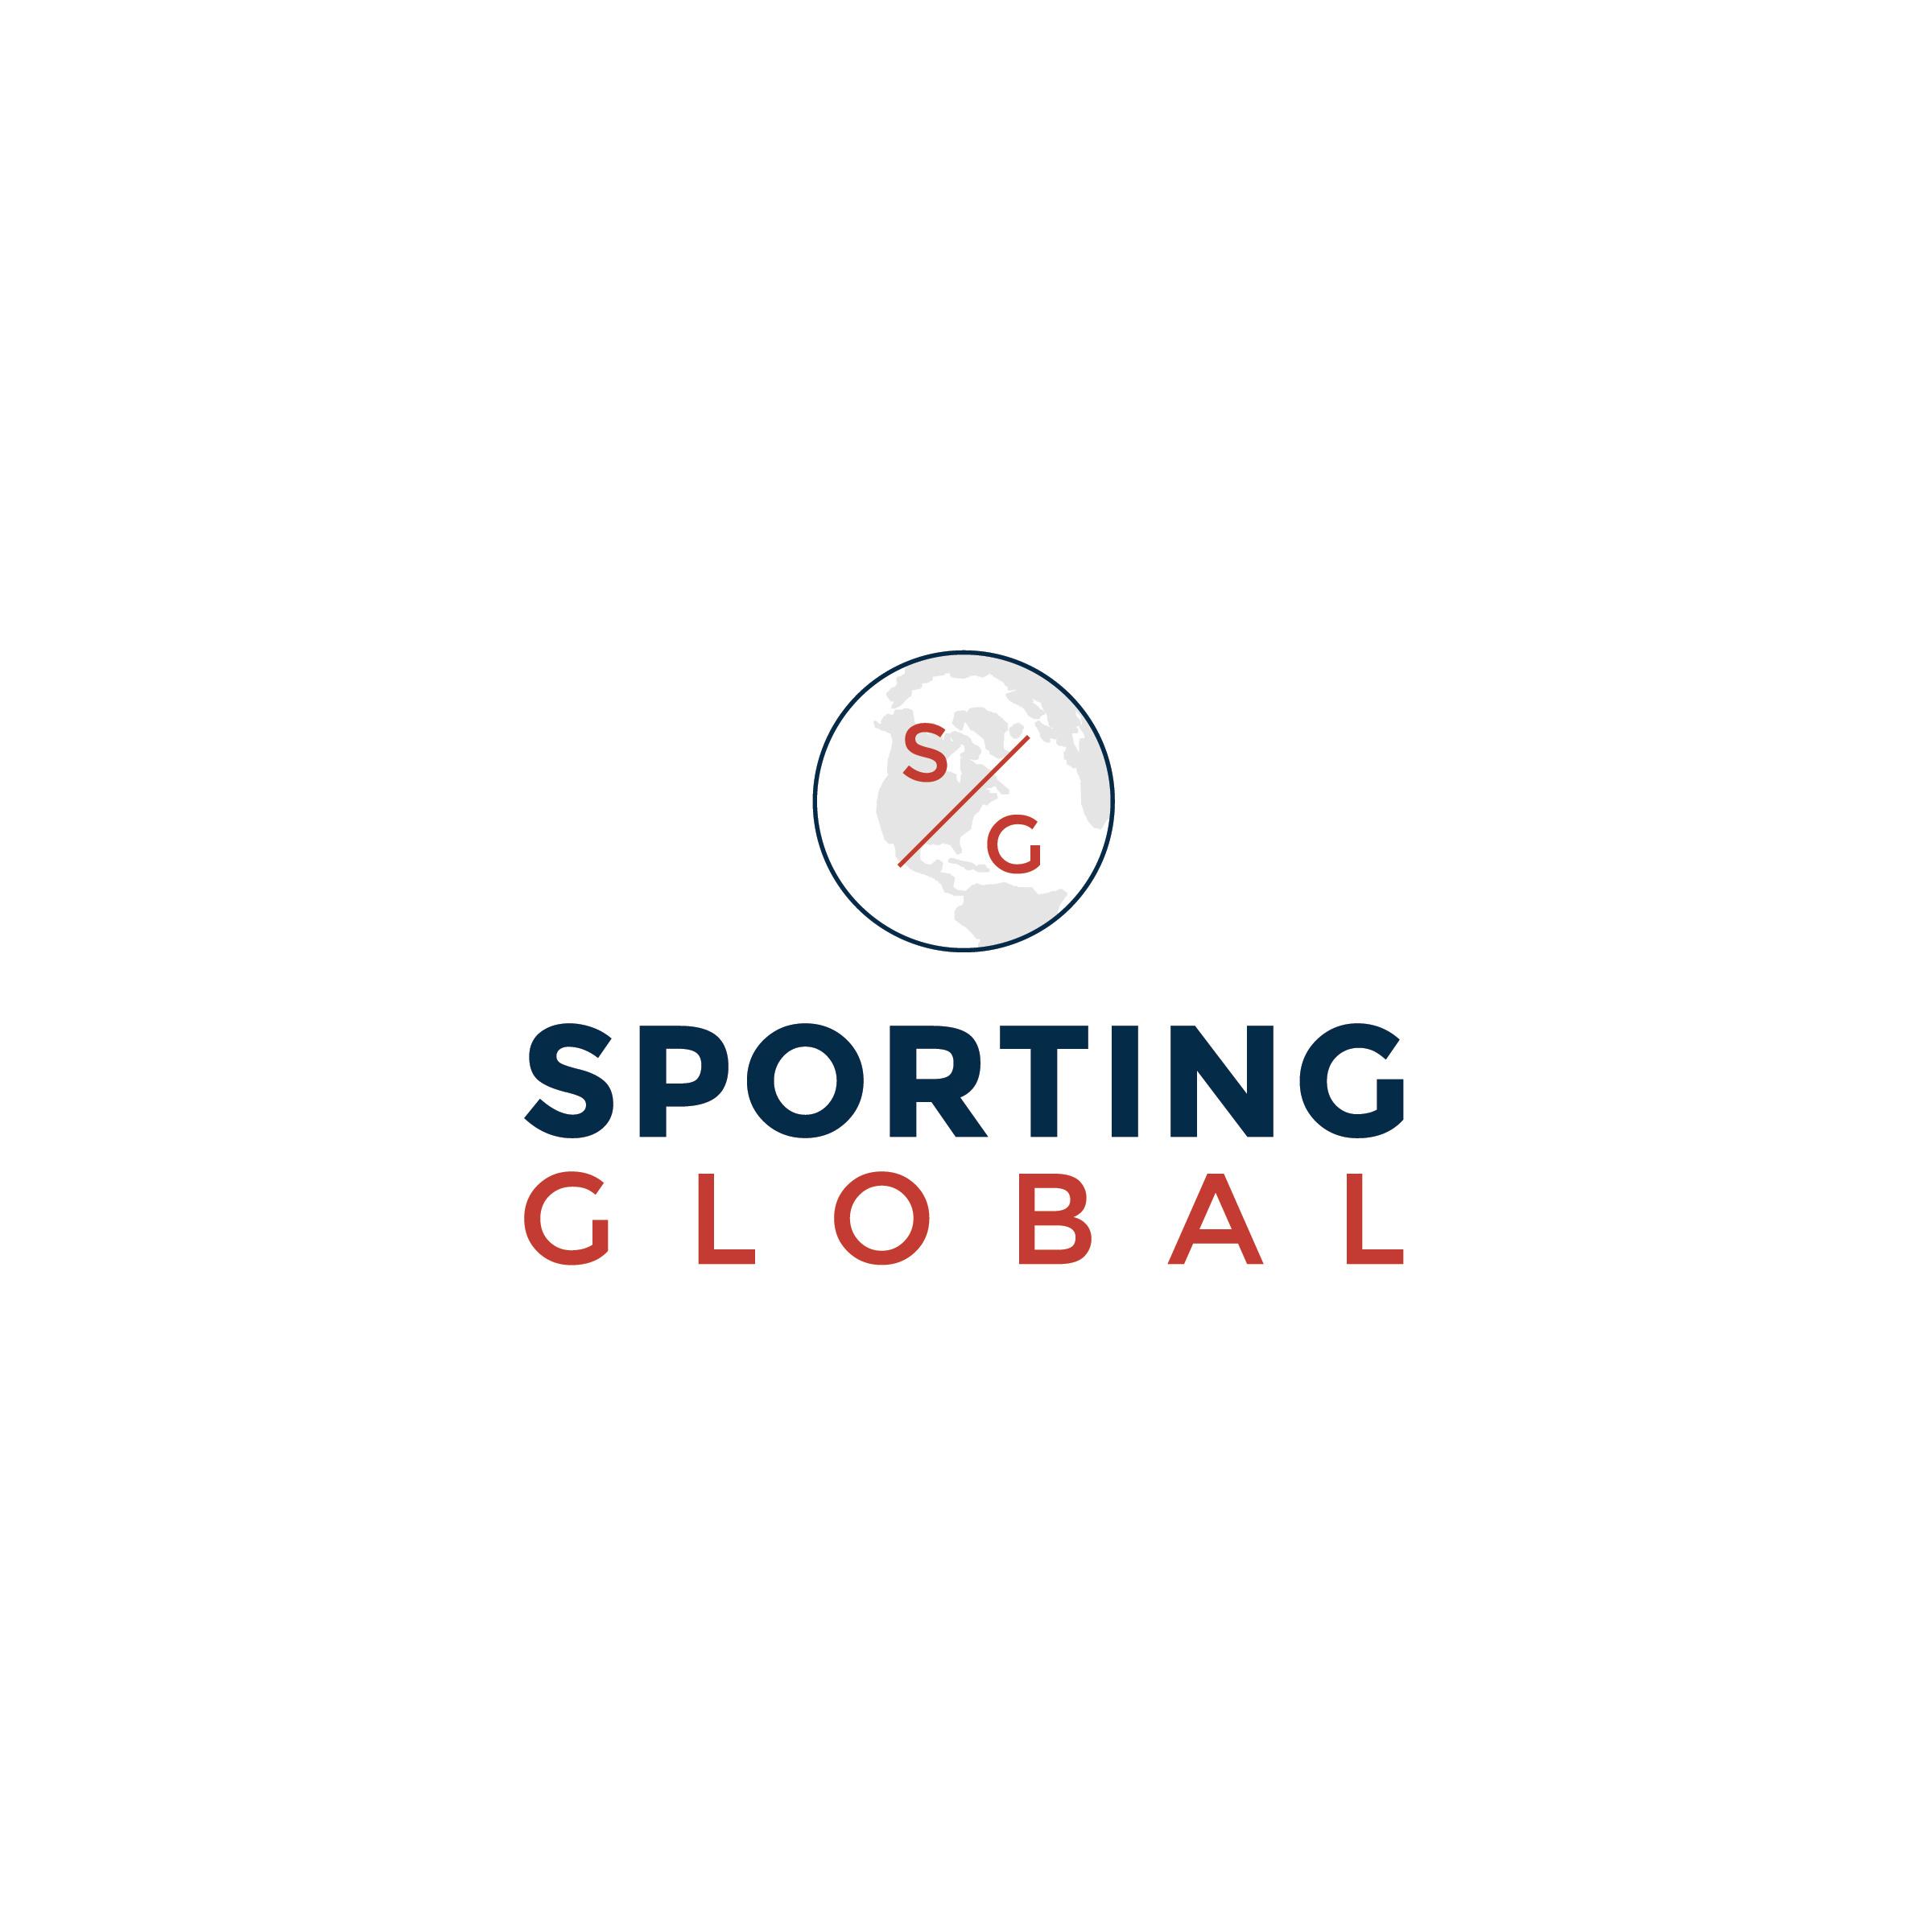 Sporting Global